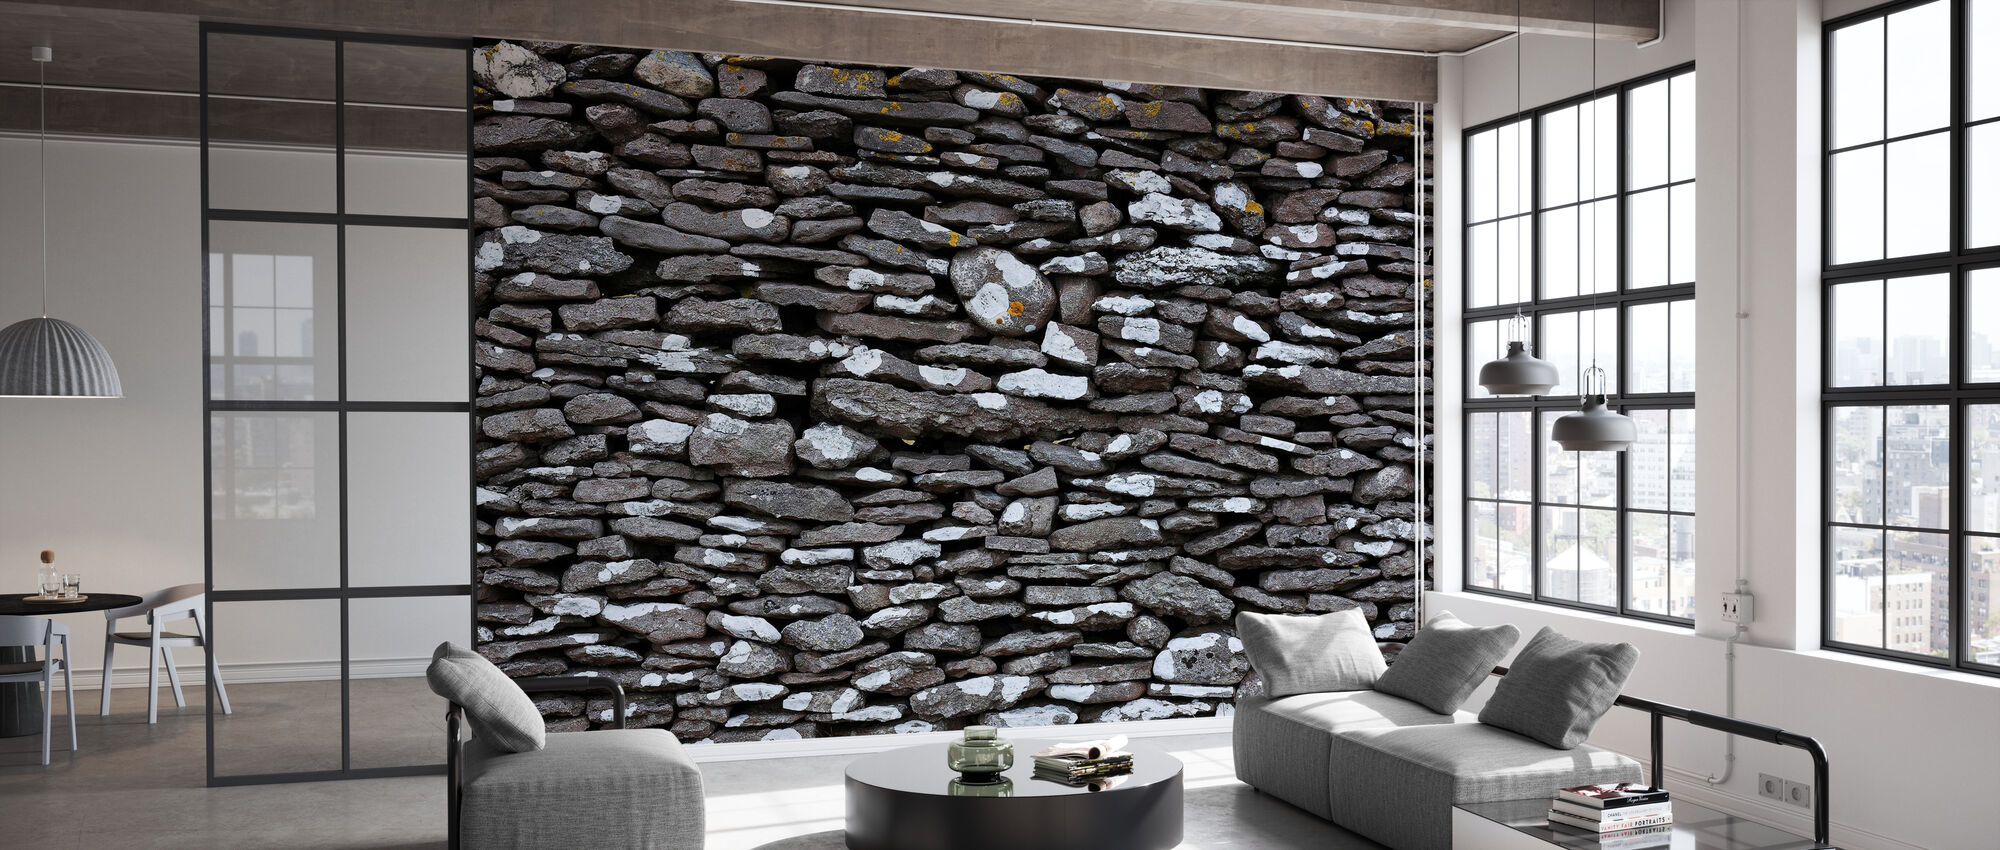 Stone Wall - Wallpaper - Office